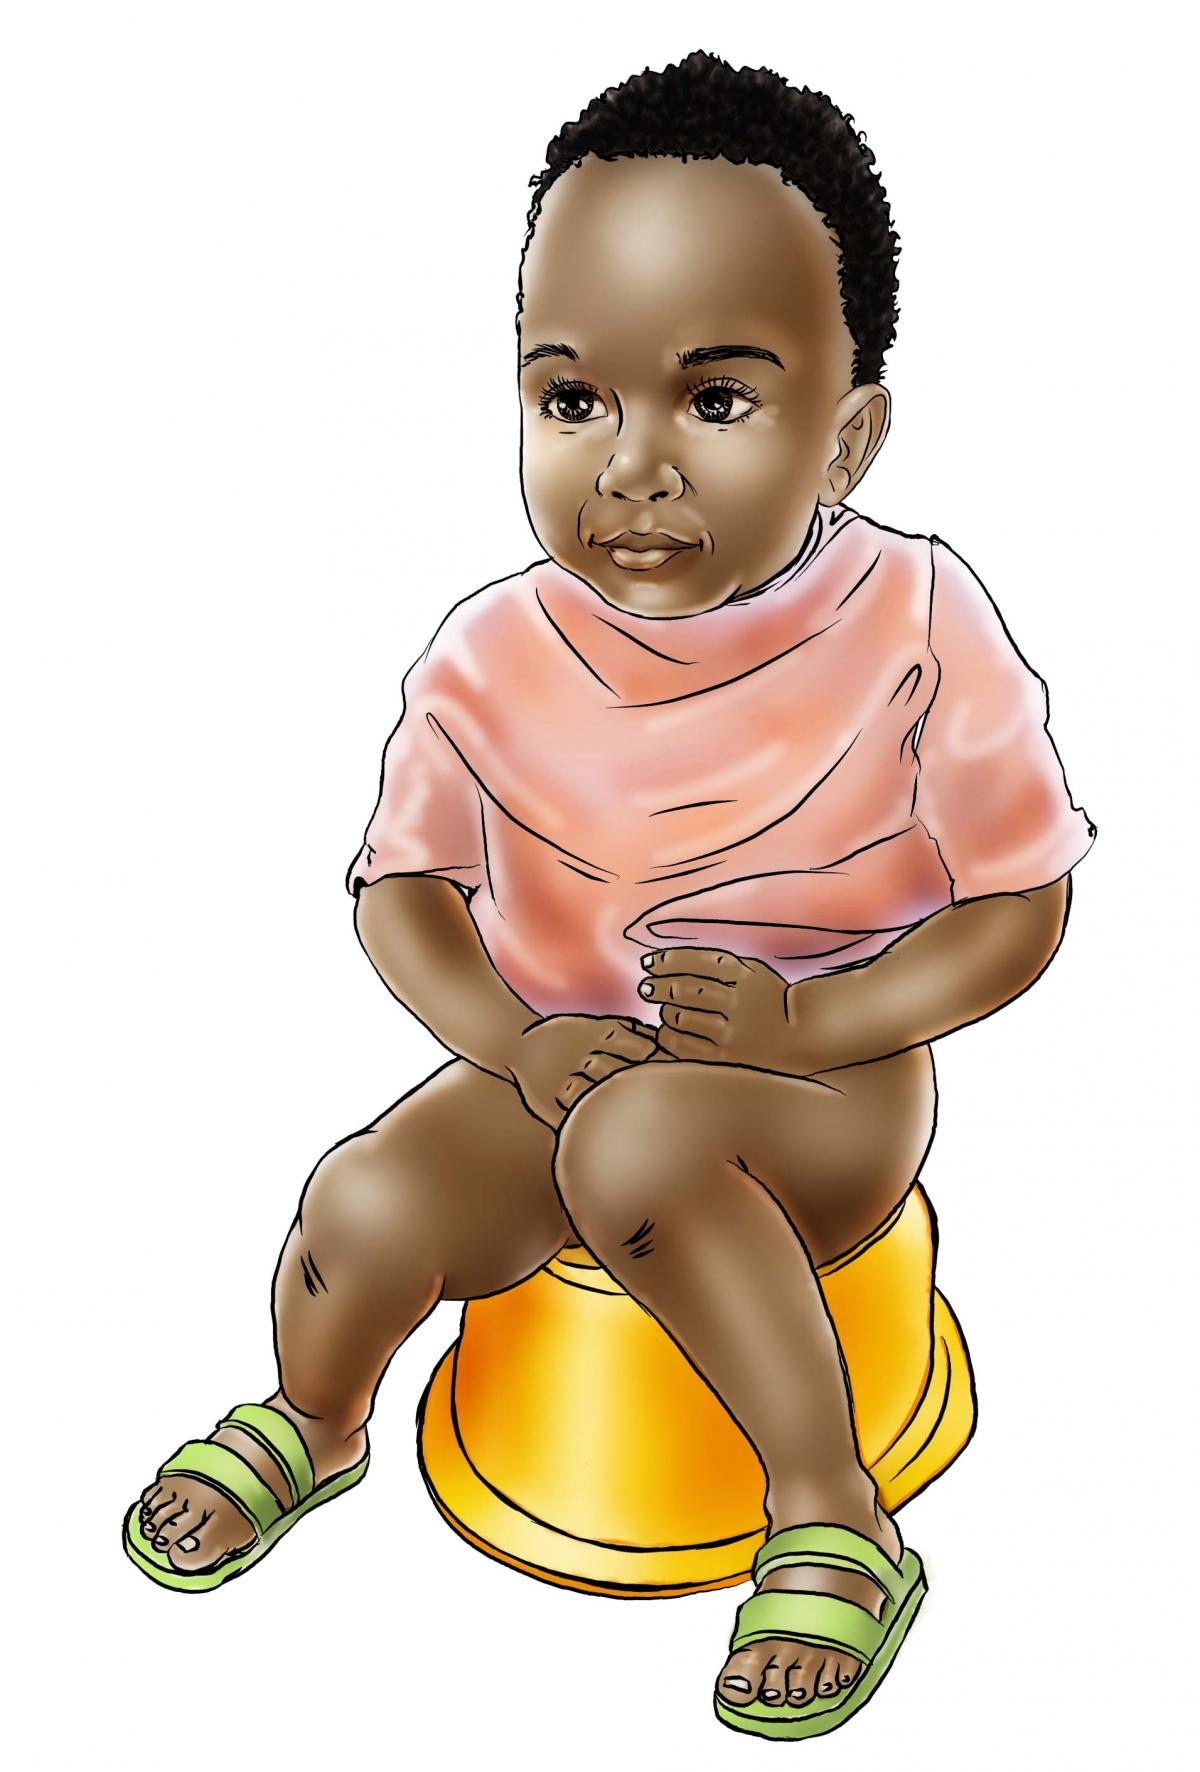 Hygiene - Child using toilet - 00 - Sierra Leone